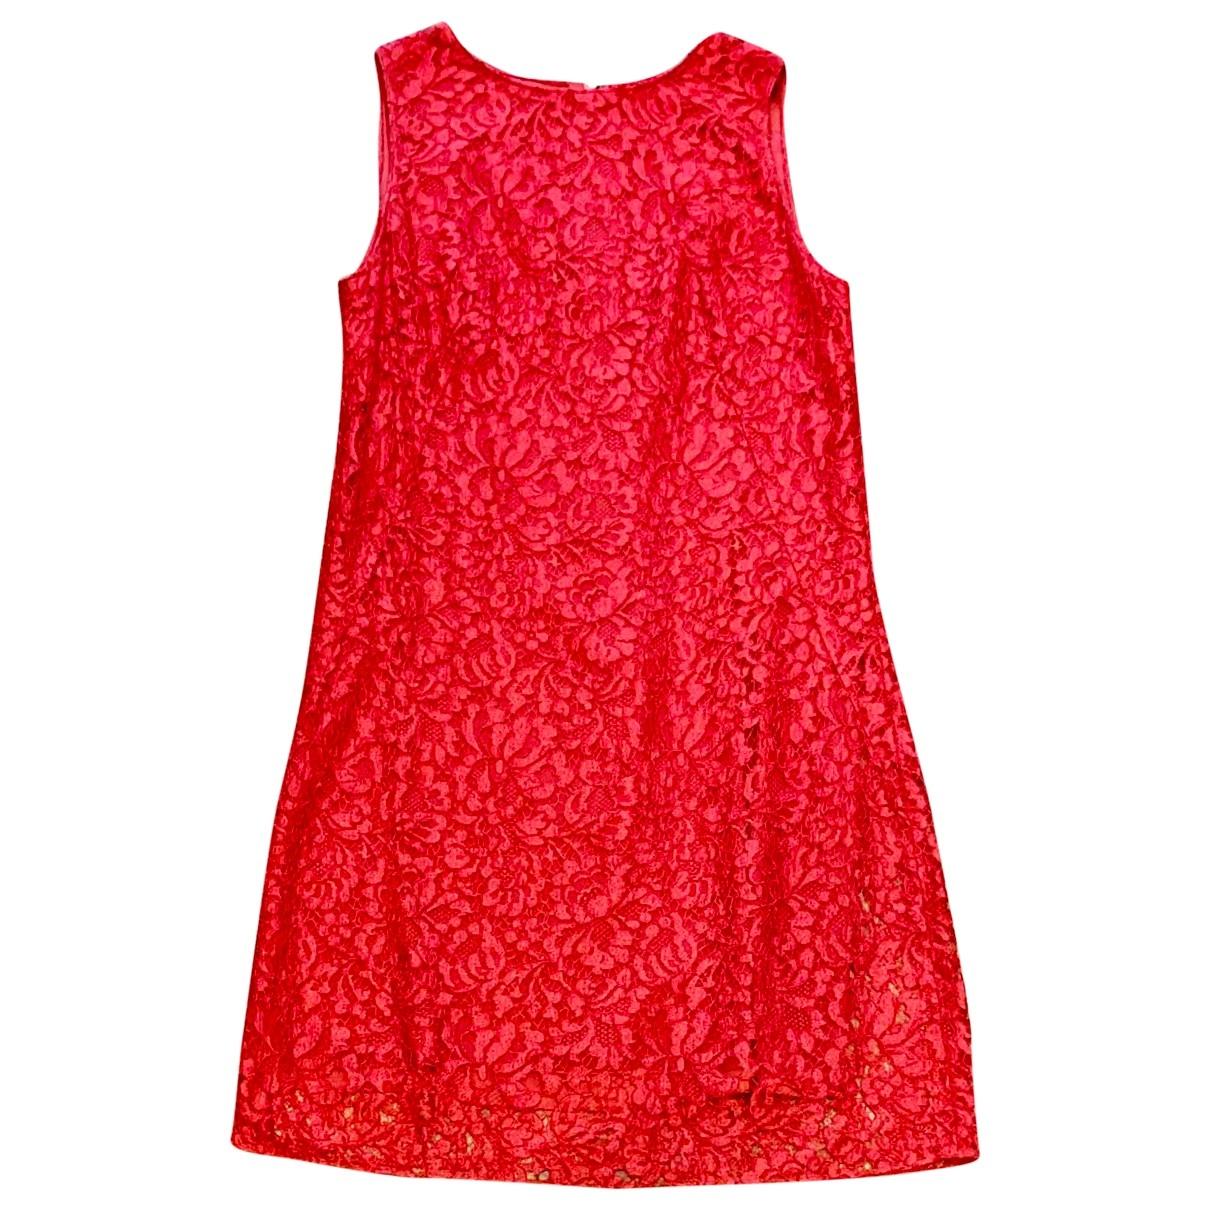 Dolce & Gabbana \N Red Lace dress for Women 42 IT